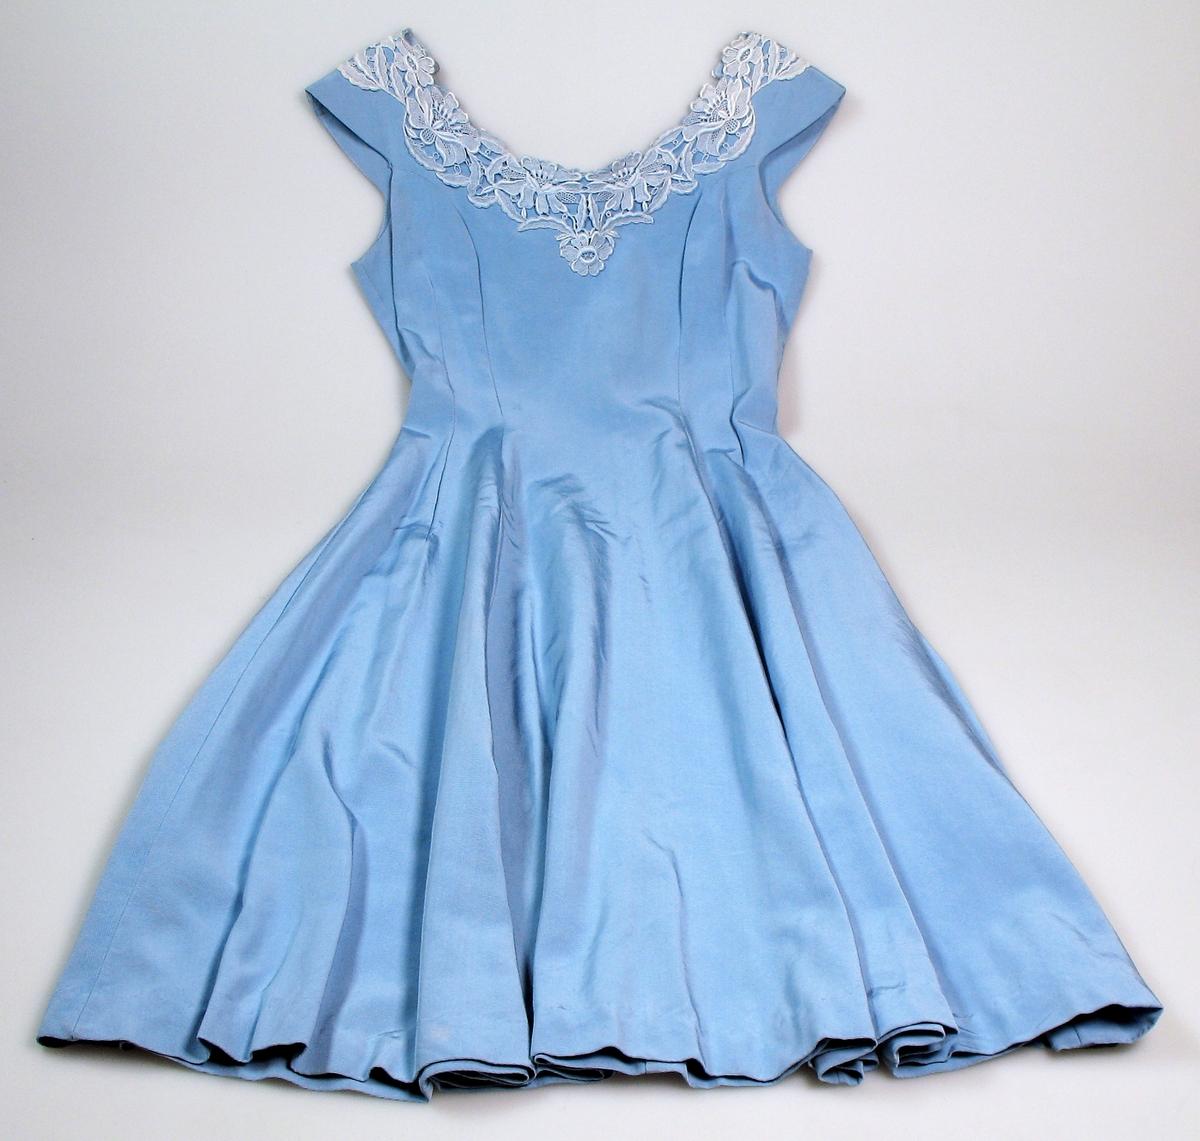 Form: Klassisk, prinsesse fasong